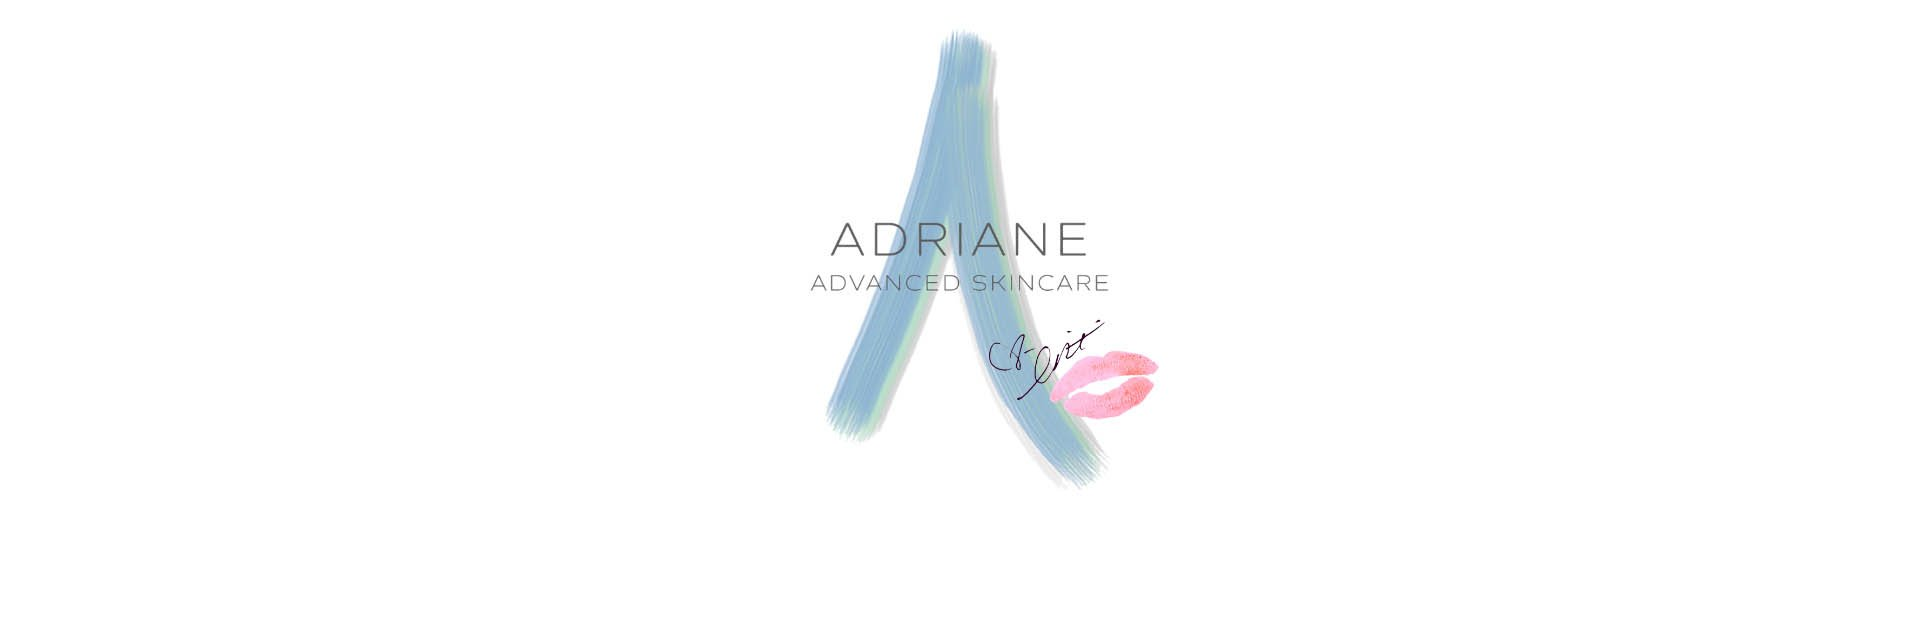 Medical Grade Skin Care | Adriane Advanced Skincare | Skin Health for life